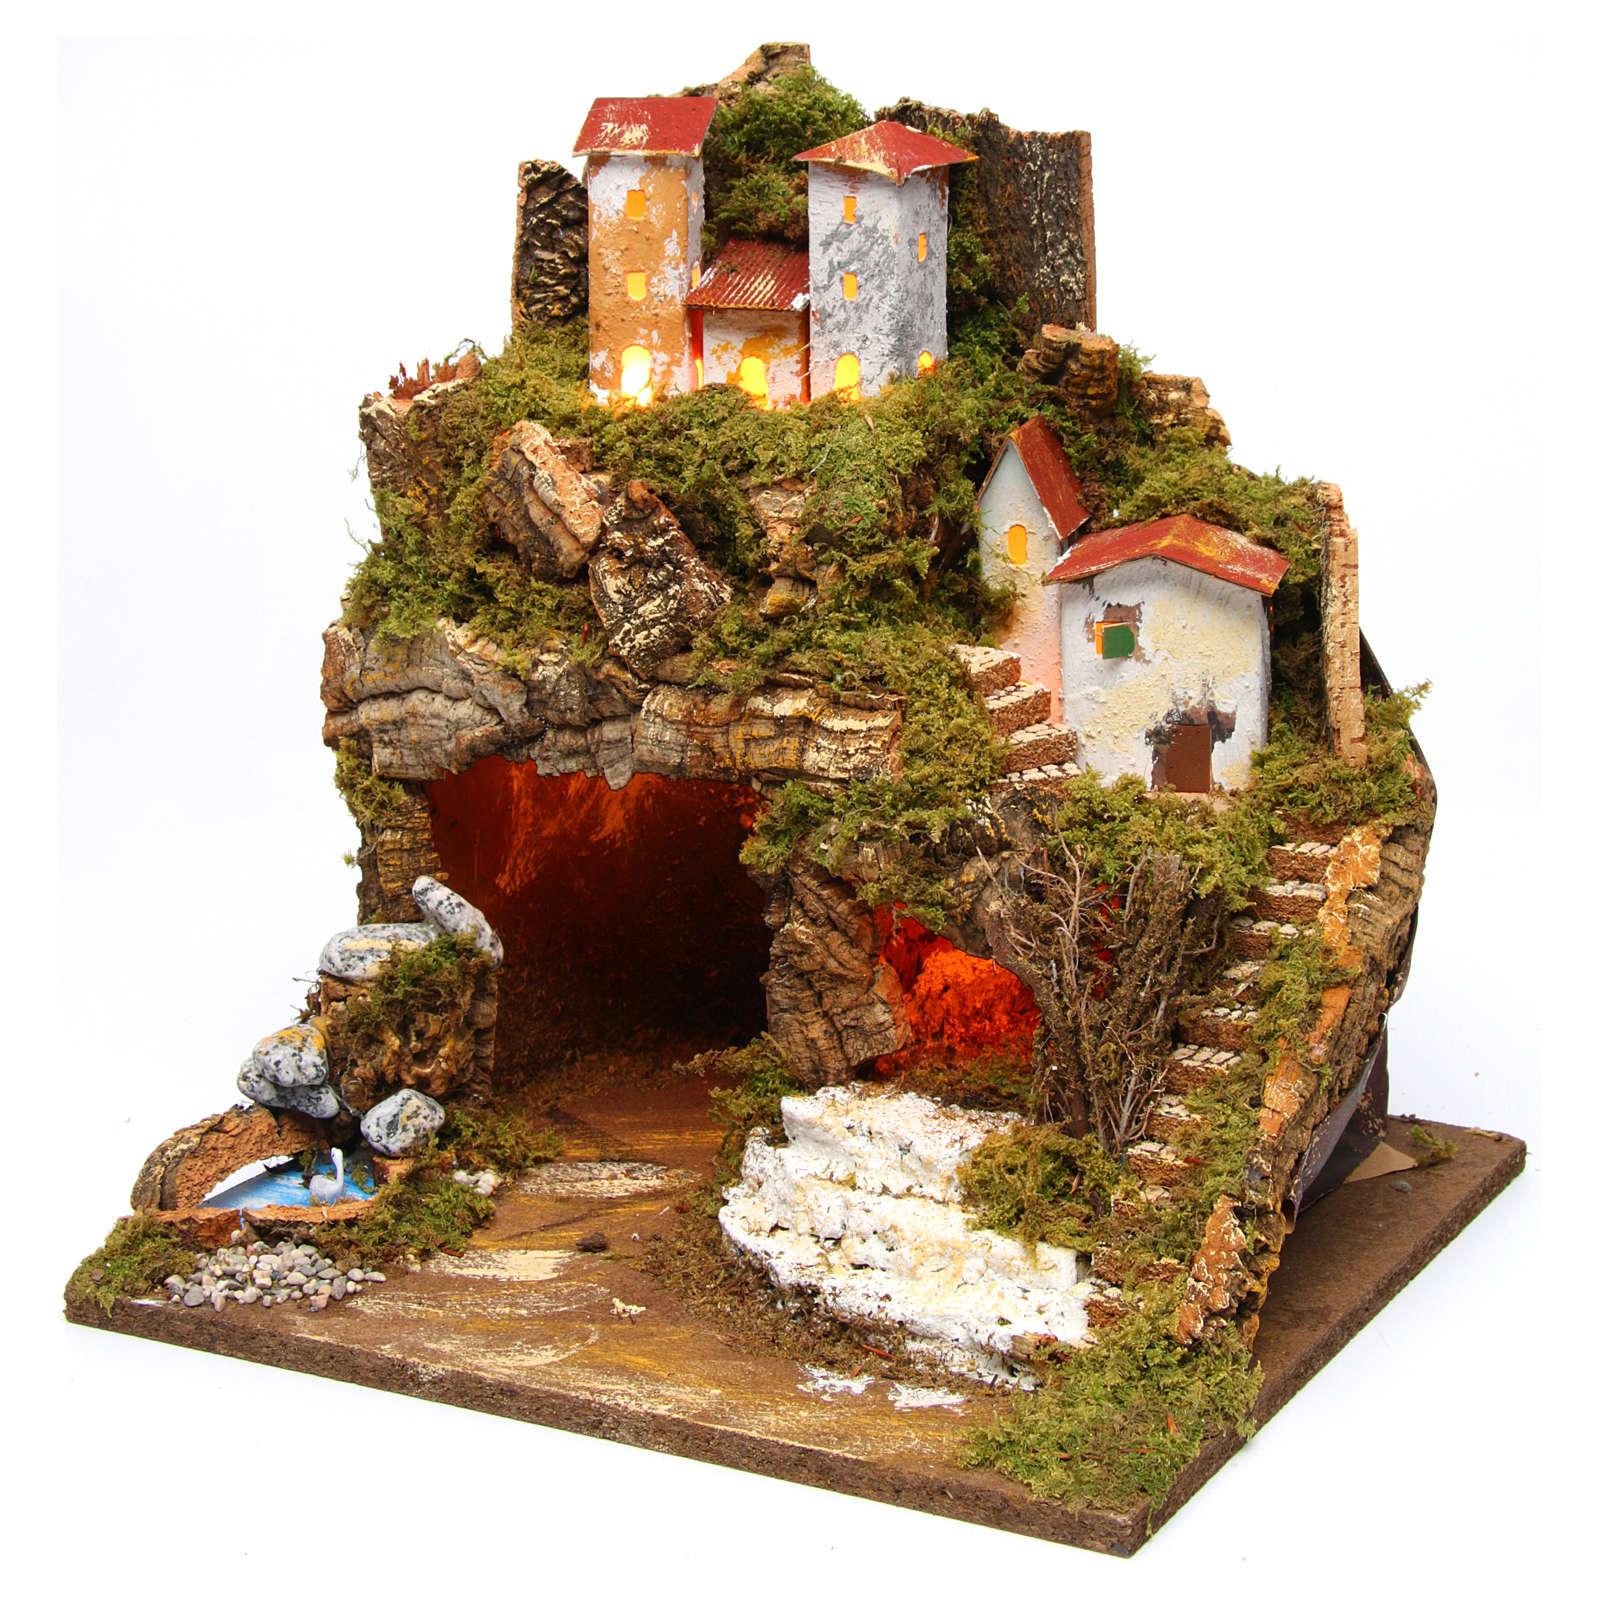 Cabaña aldea belén 8-10 cm de altura media luces 35x33x30 cm 4